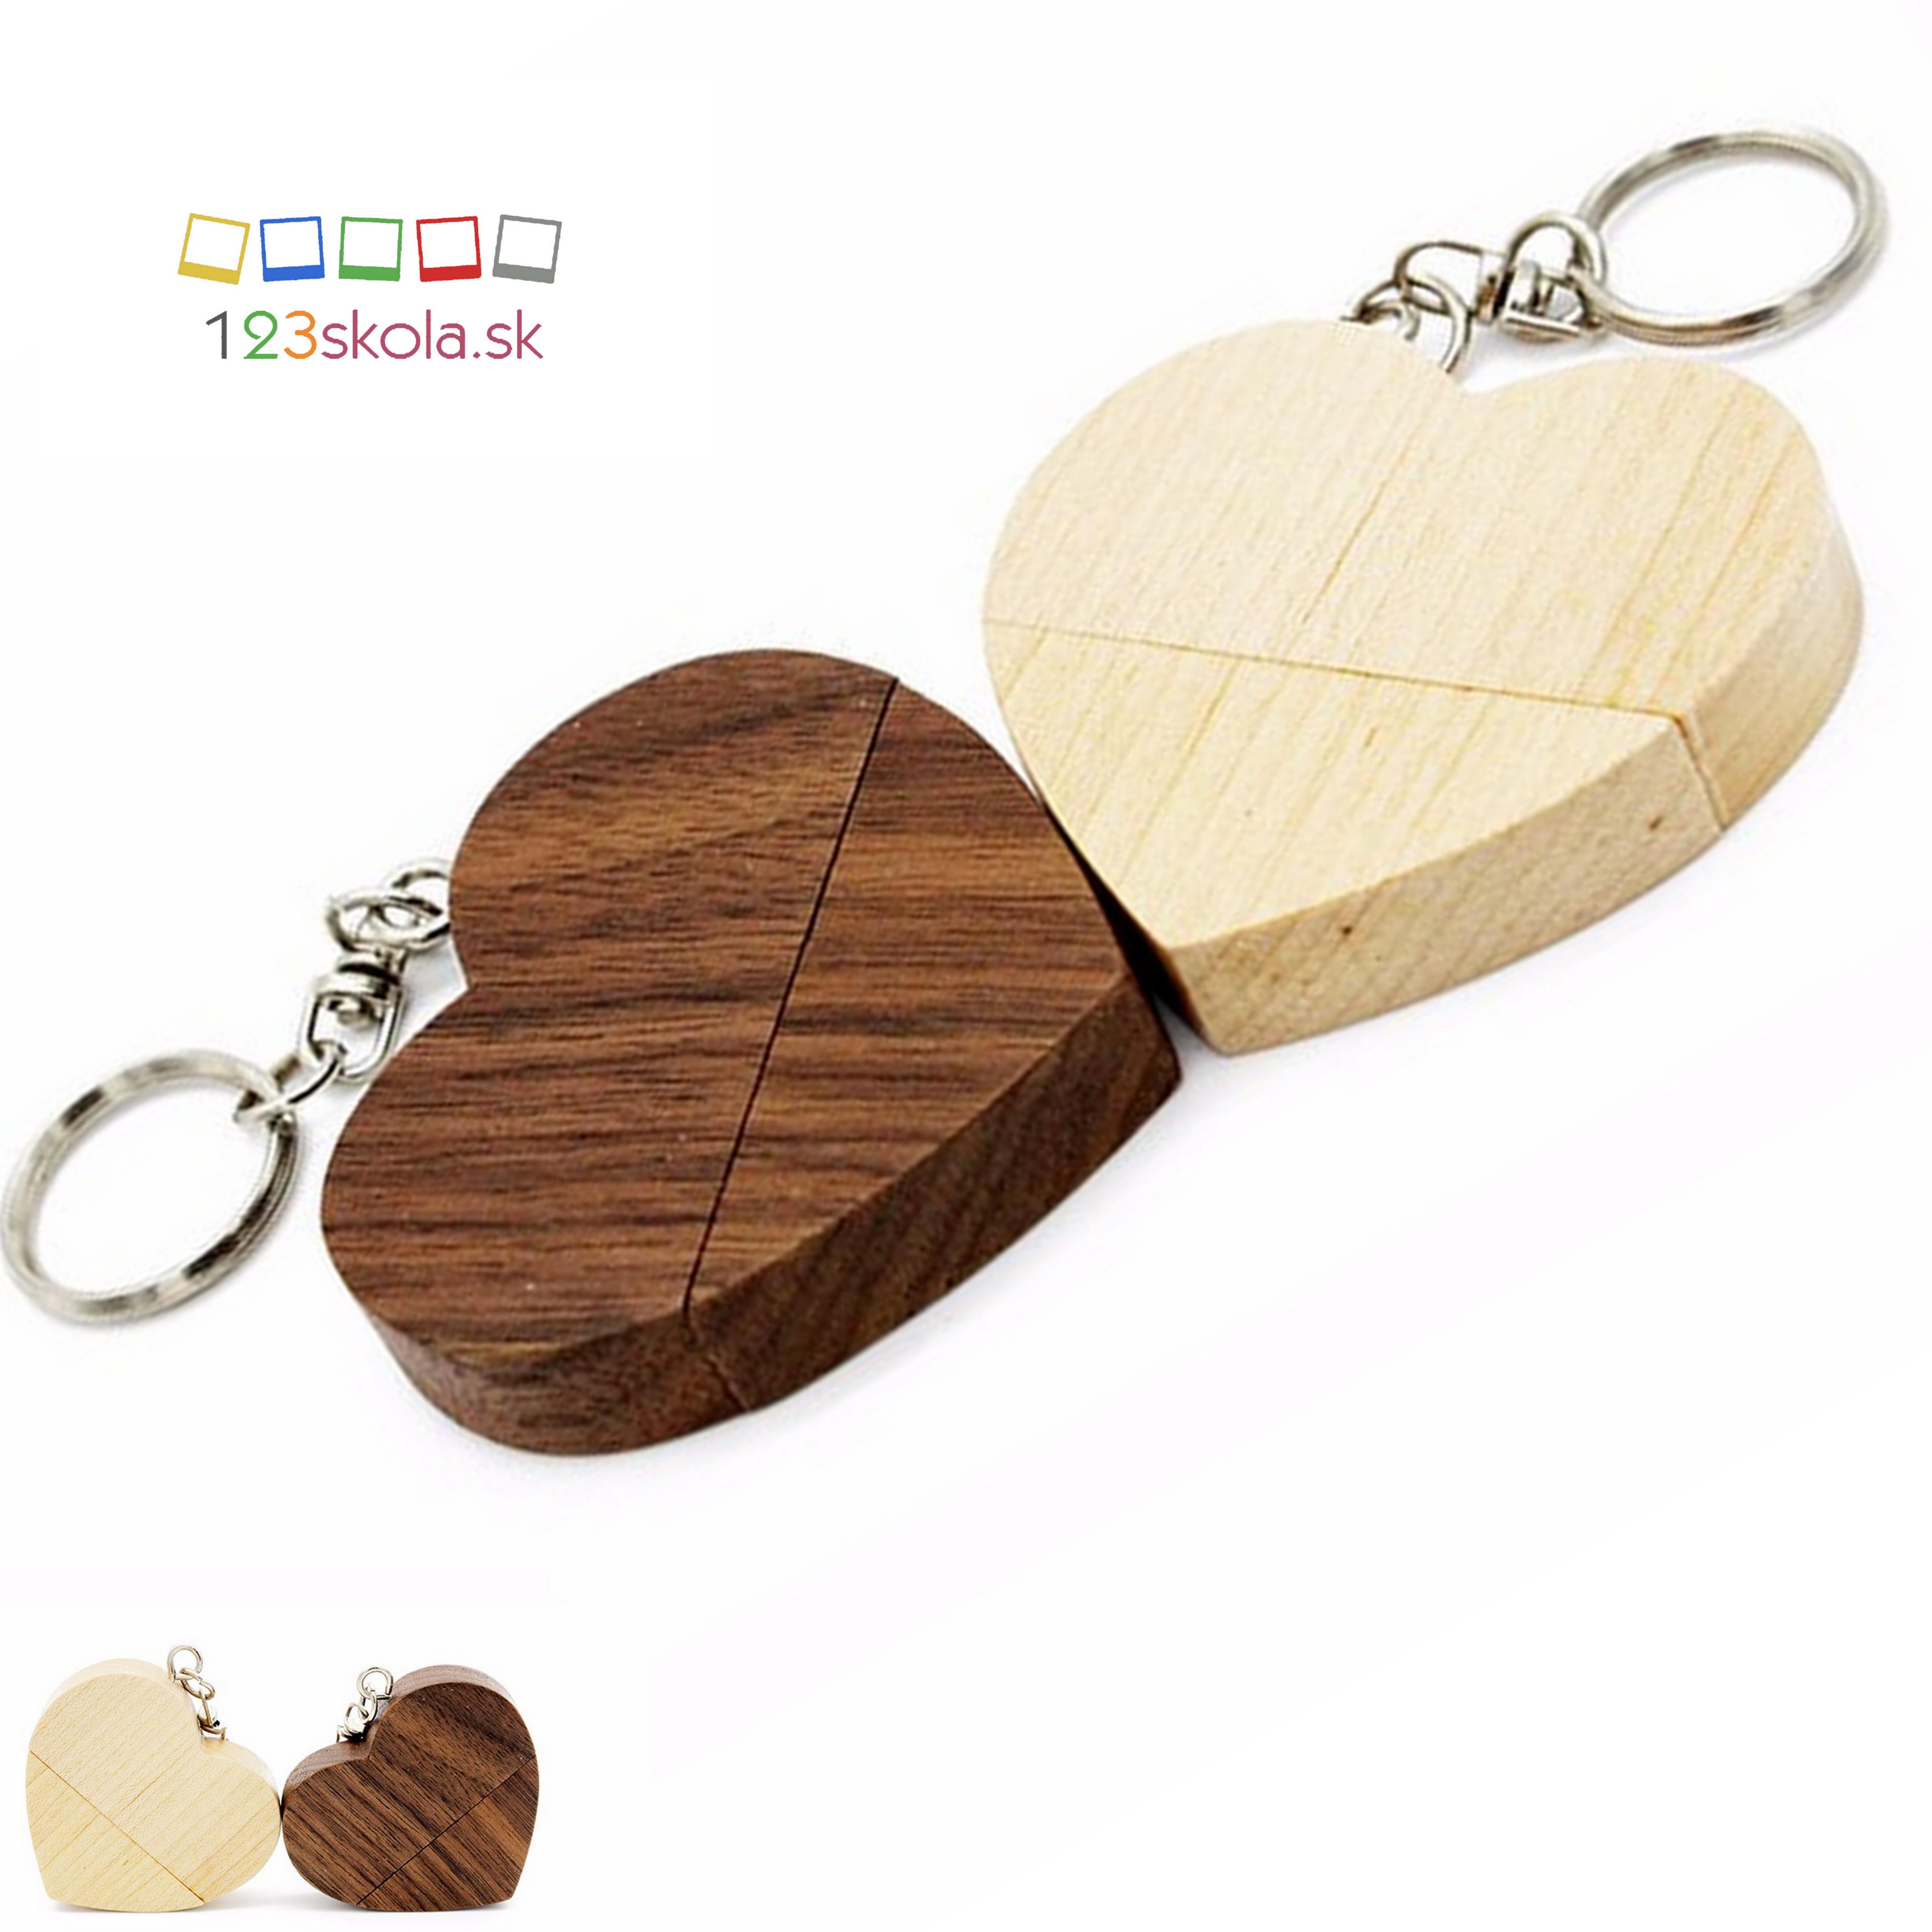 USB kľúč - prívesok SRDIEČKO  37481f1392b